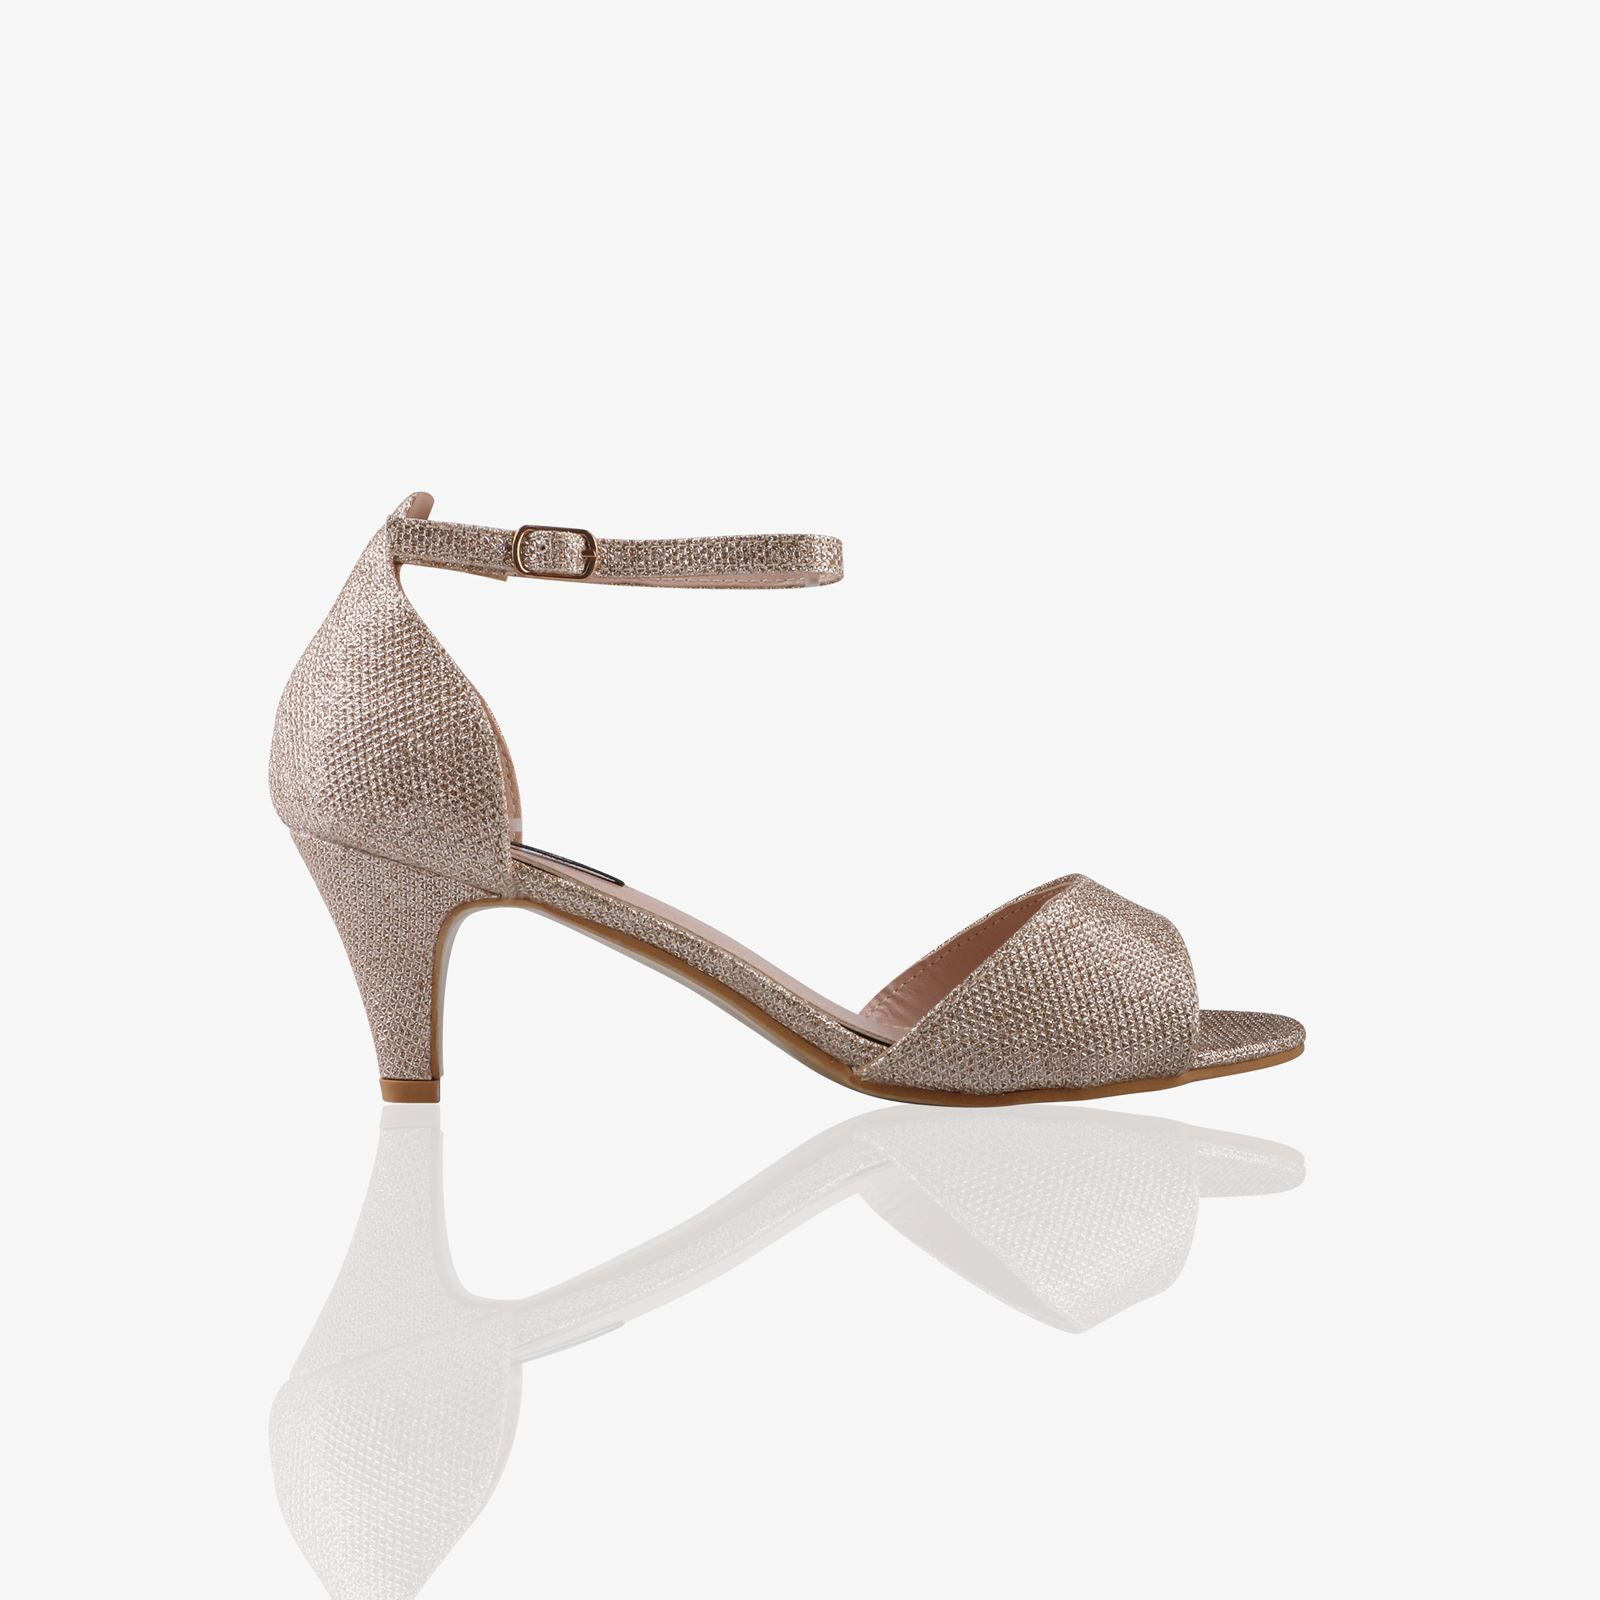 Details about Women Ladies Low Kitten Heel Court Shoes Open Toe Glitter Sandals Party Bridal